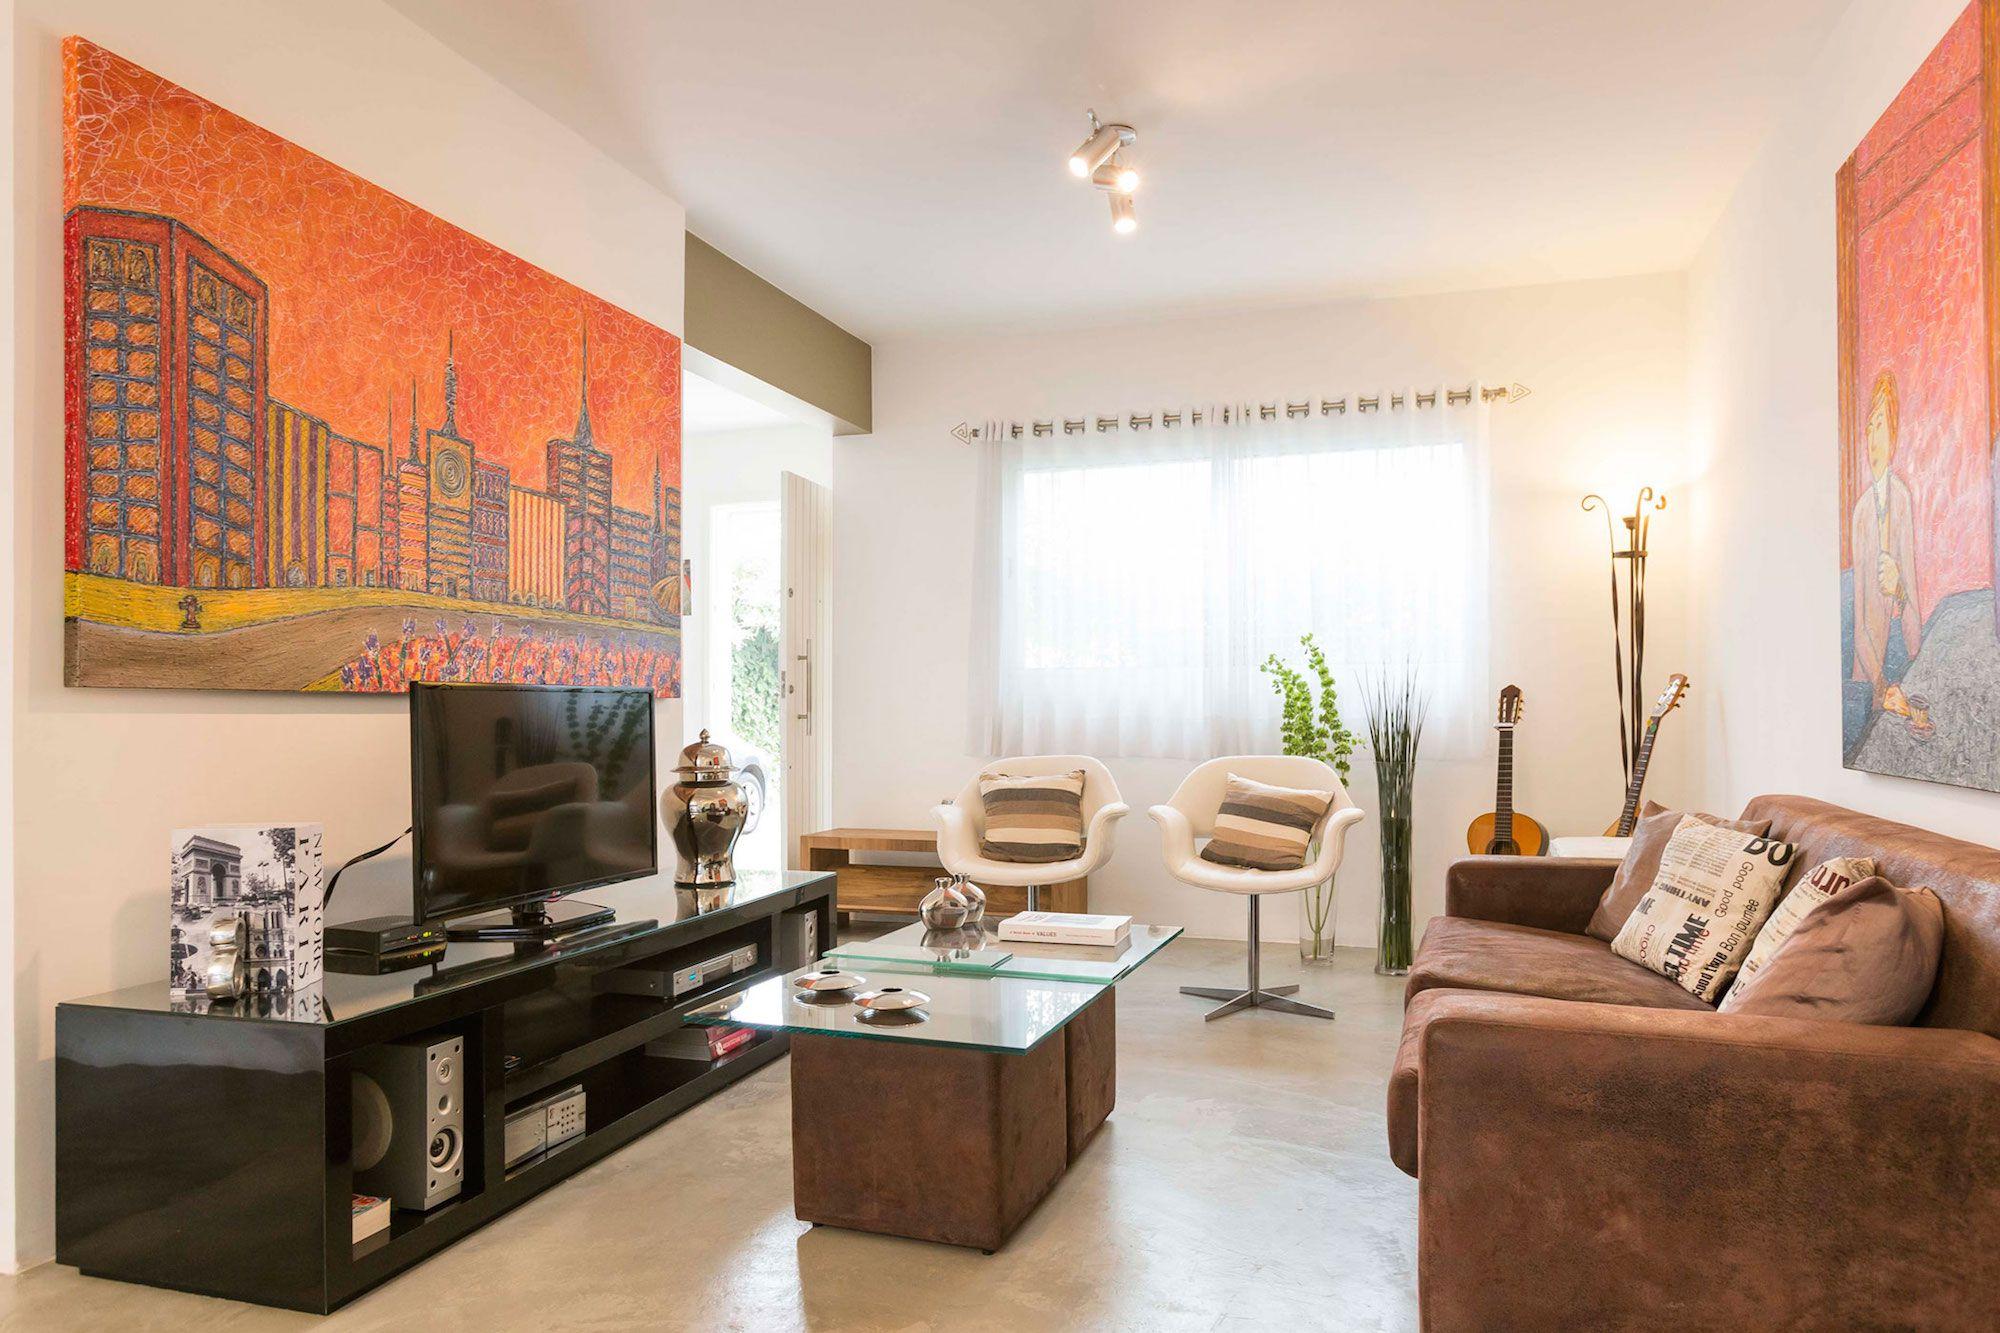 Granja-Julieta-Residence-14